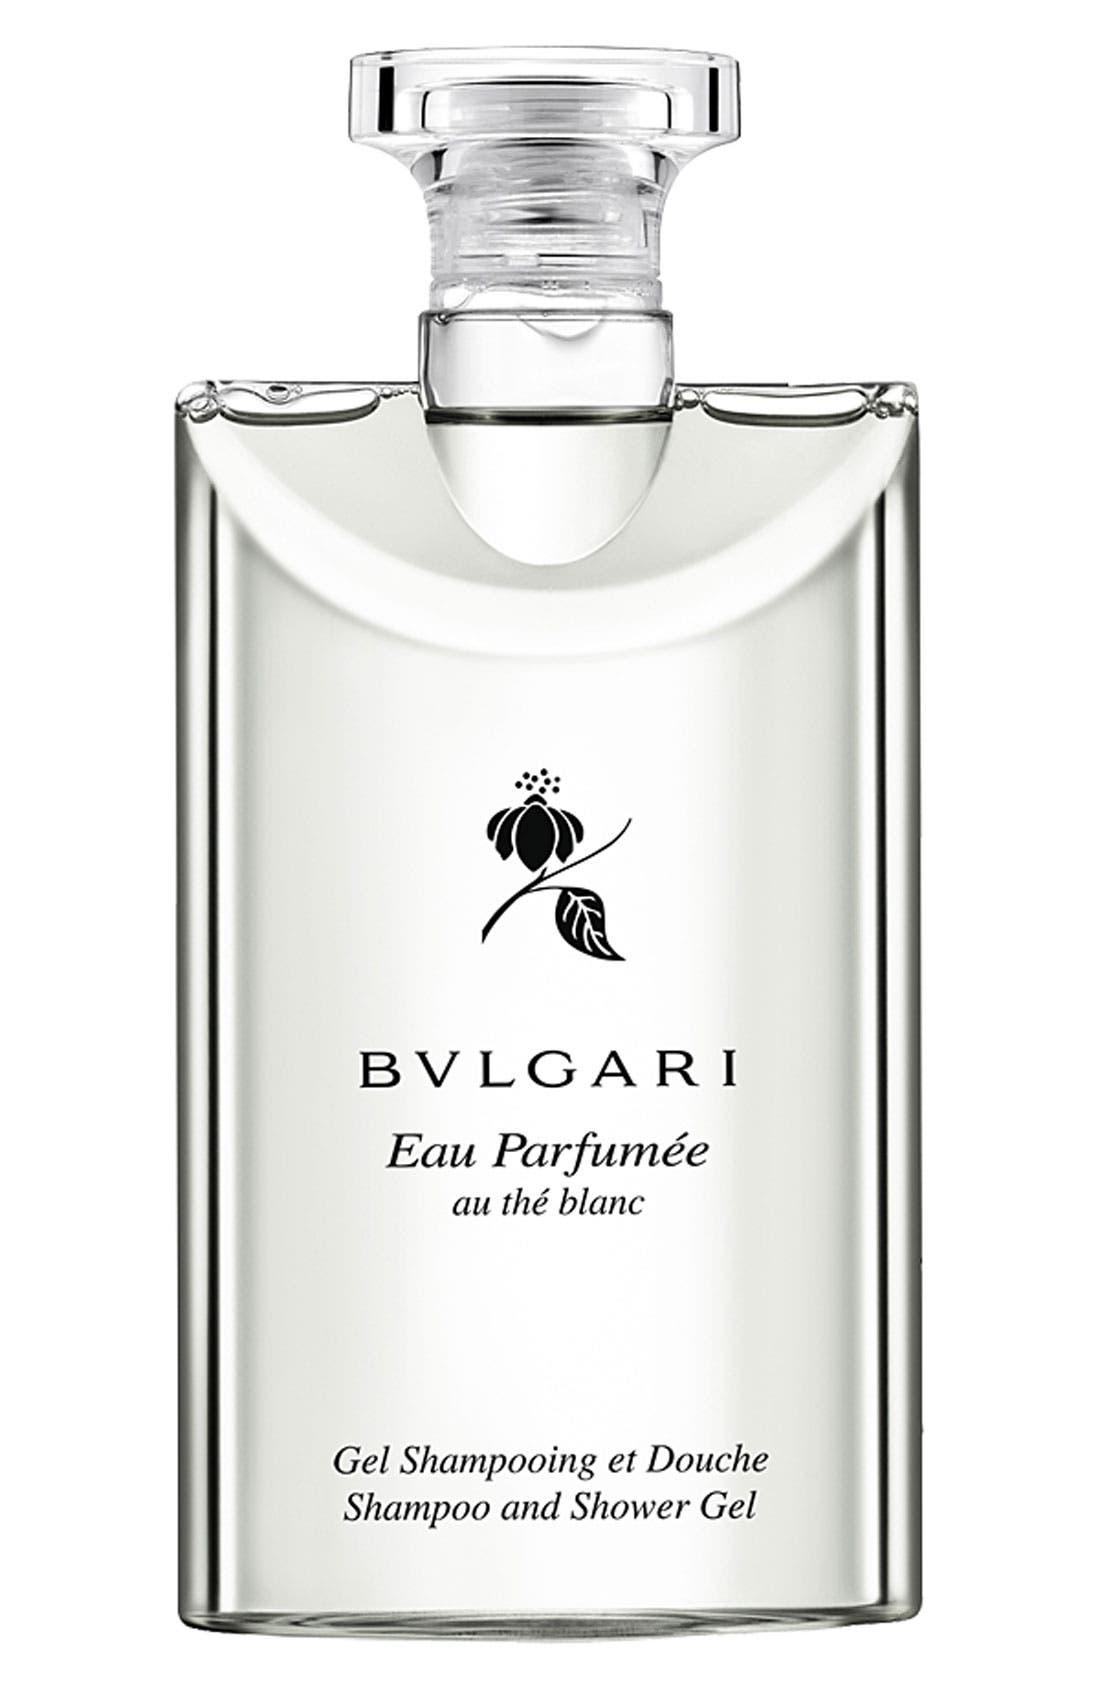 BVLGARI 'Eau Parfumée au thé blanc' Shampoo & Shower Gel